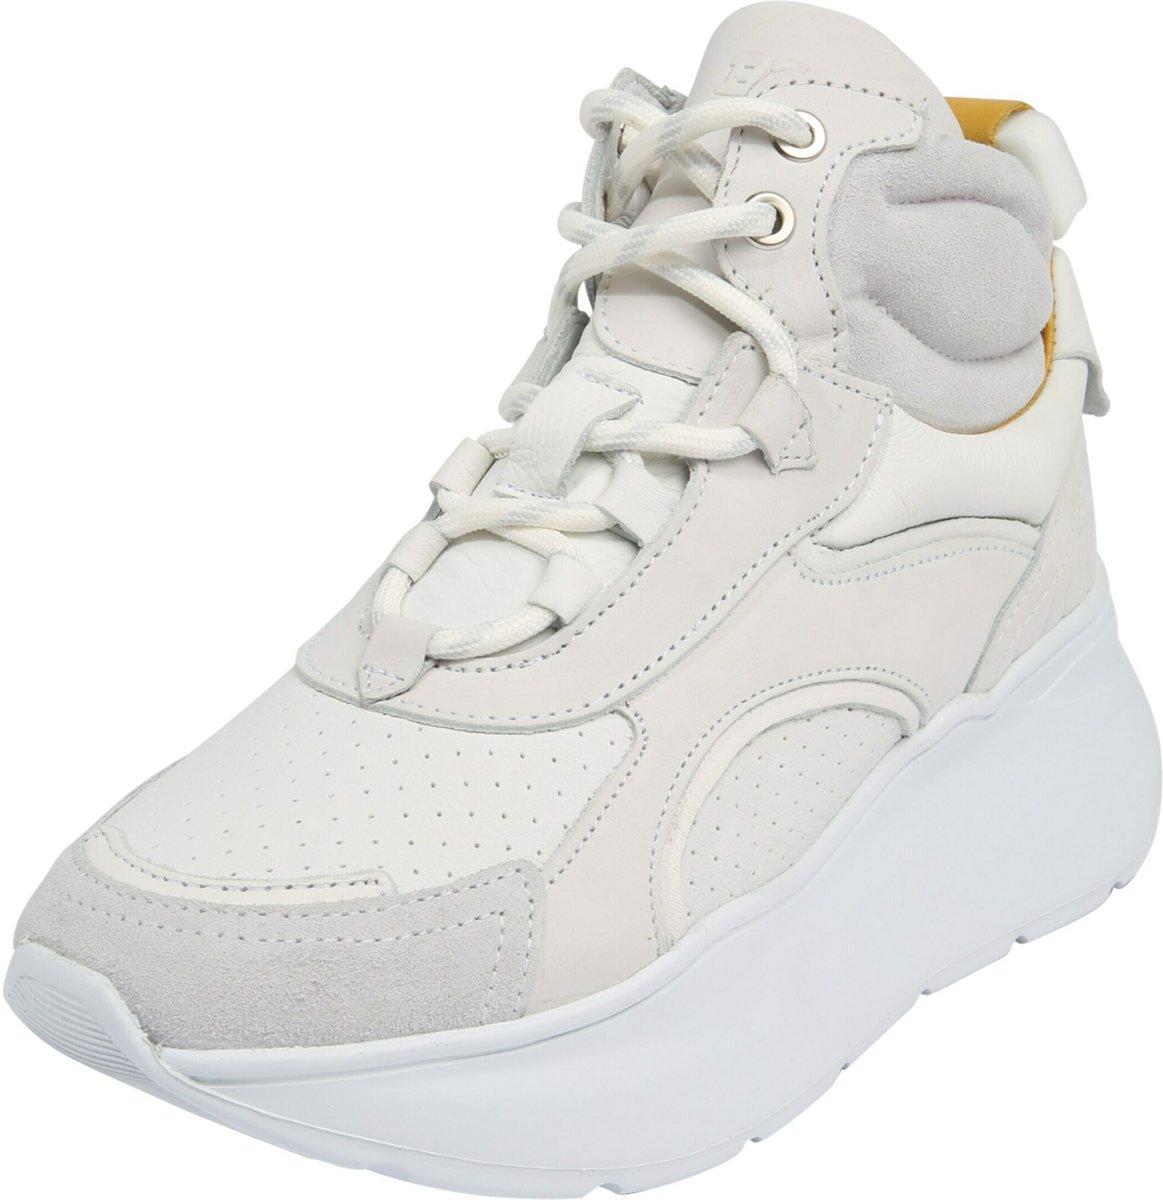 Bronx sneakers hoog grayson Wit 36